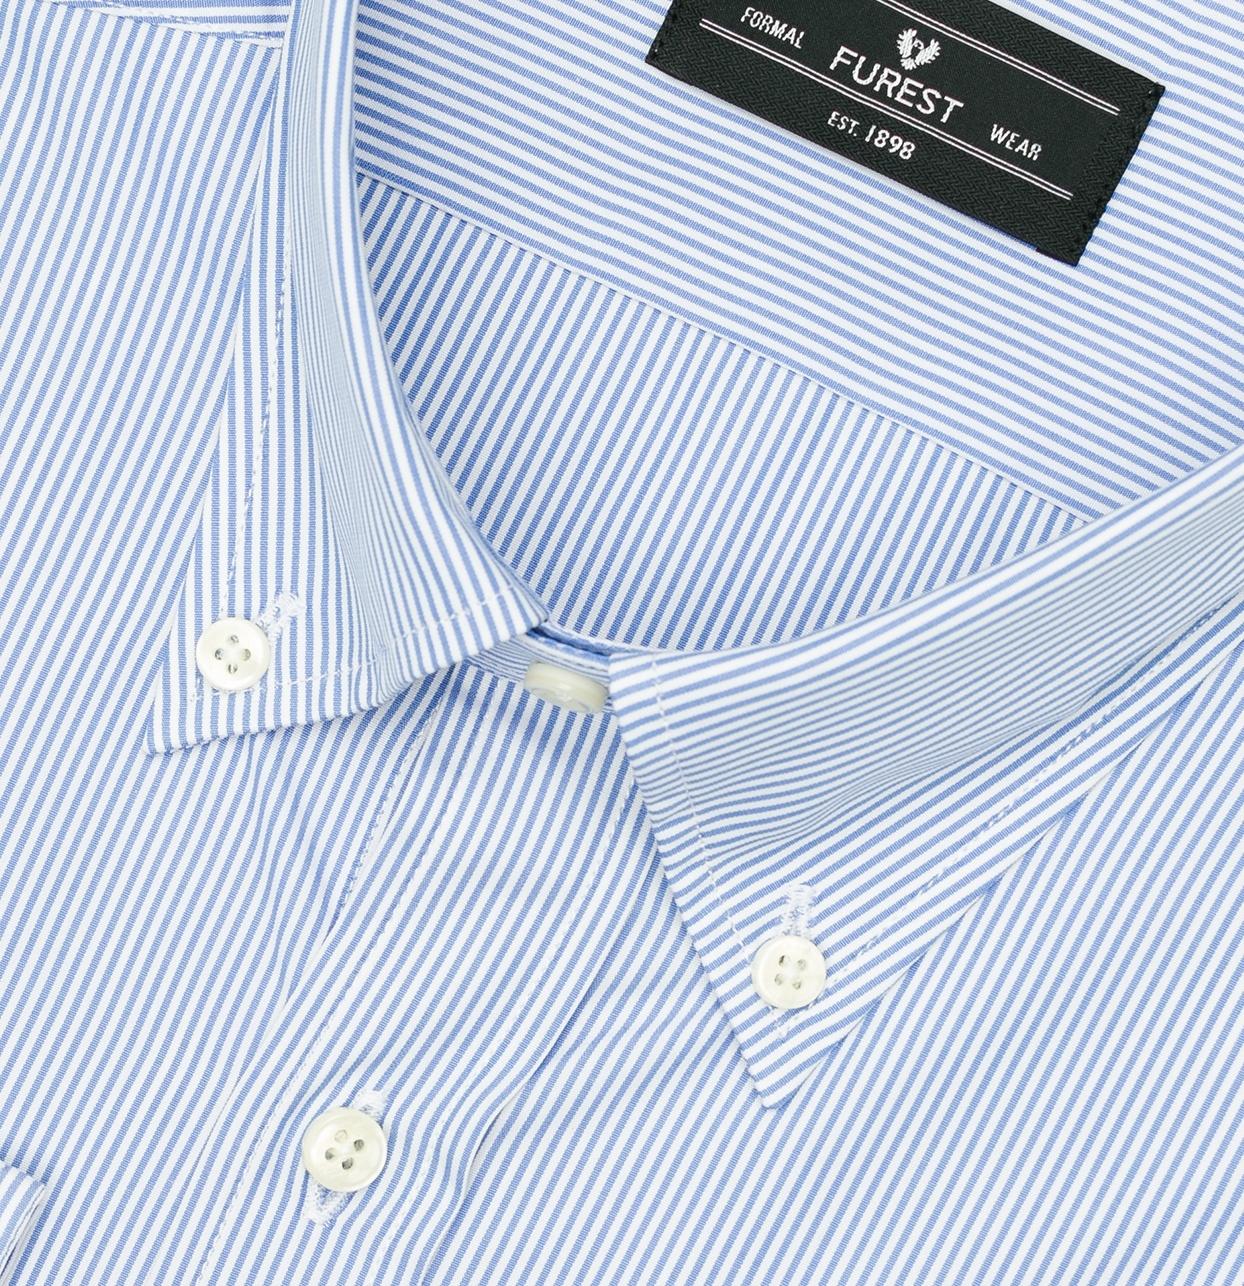 Camisa Formal Wear REGULAR FIT modelo BUTTON DOWN tejido rayas color azul,100% Algodón. - Ítem1